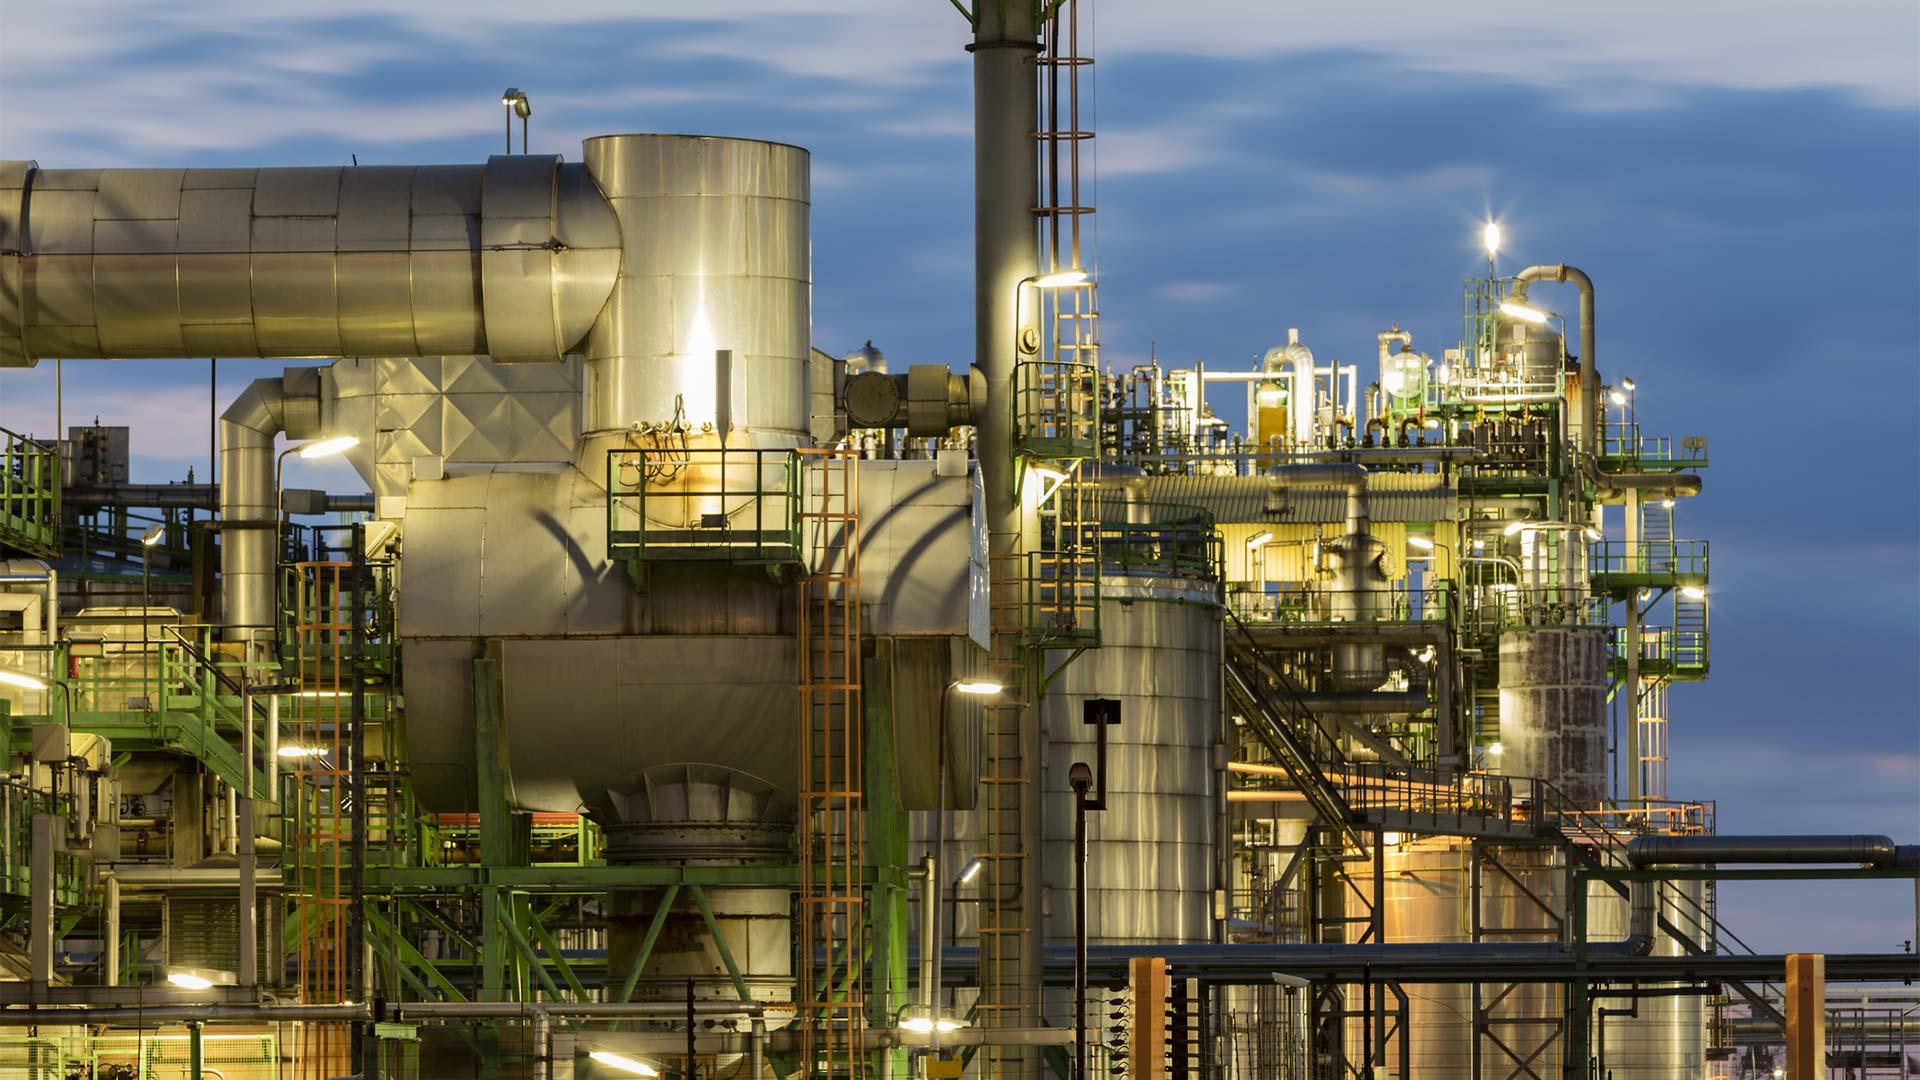 industrial-plants-energy-audits-1920